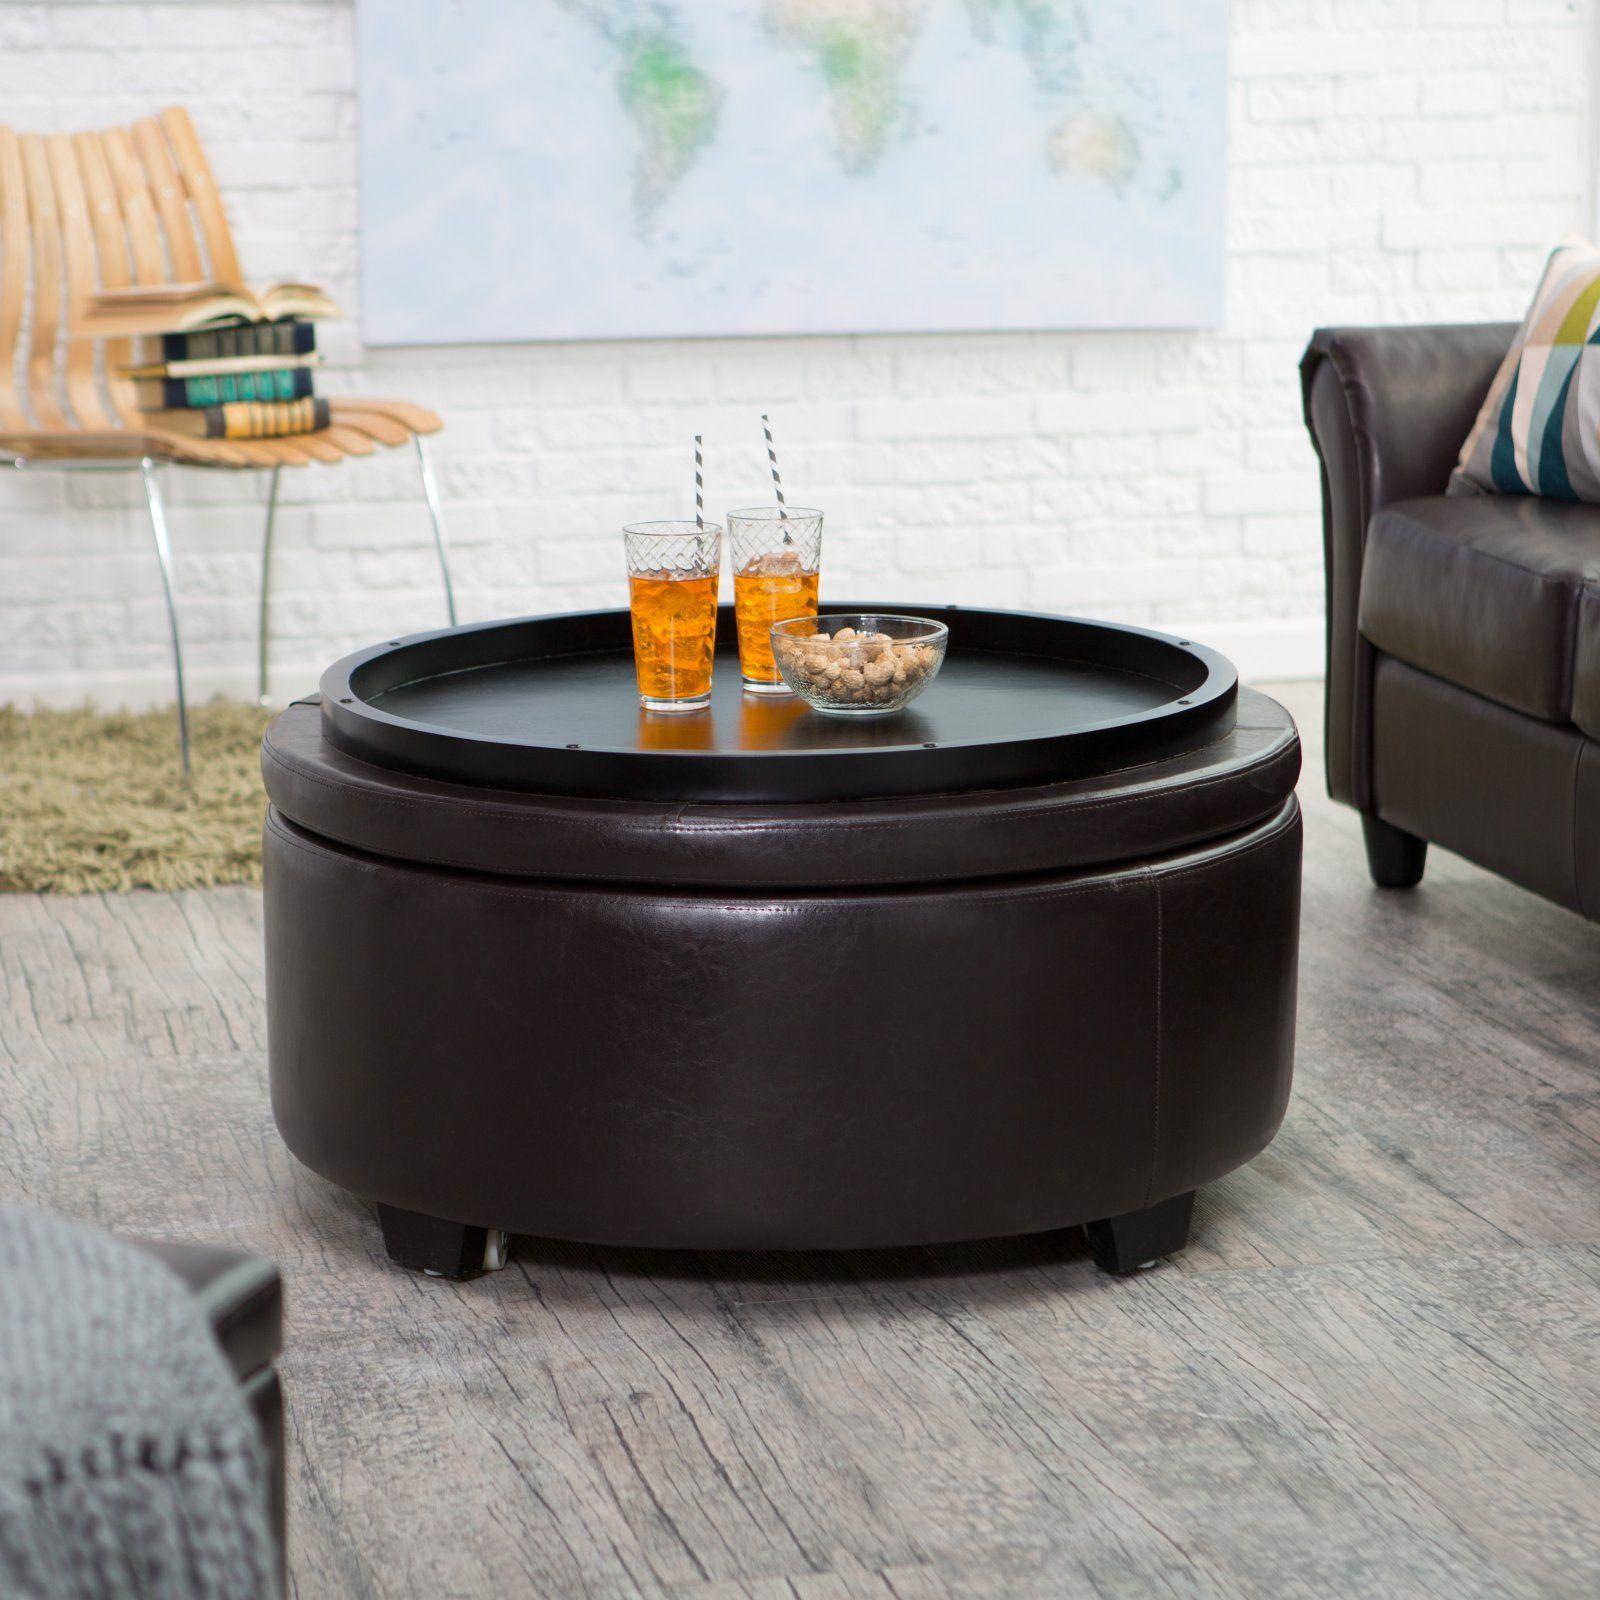 Amazon.com - Belham Living Corbett Round Coffee Table Storage Ottoman -